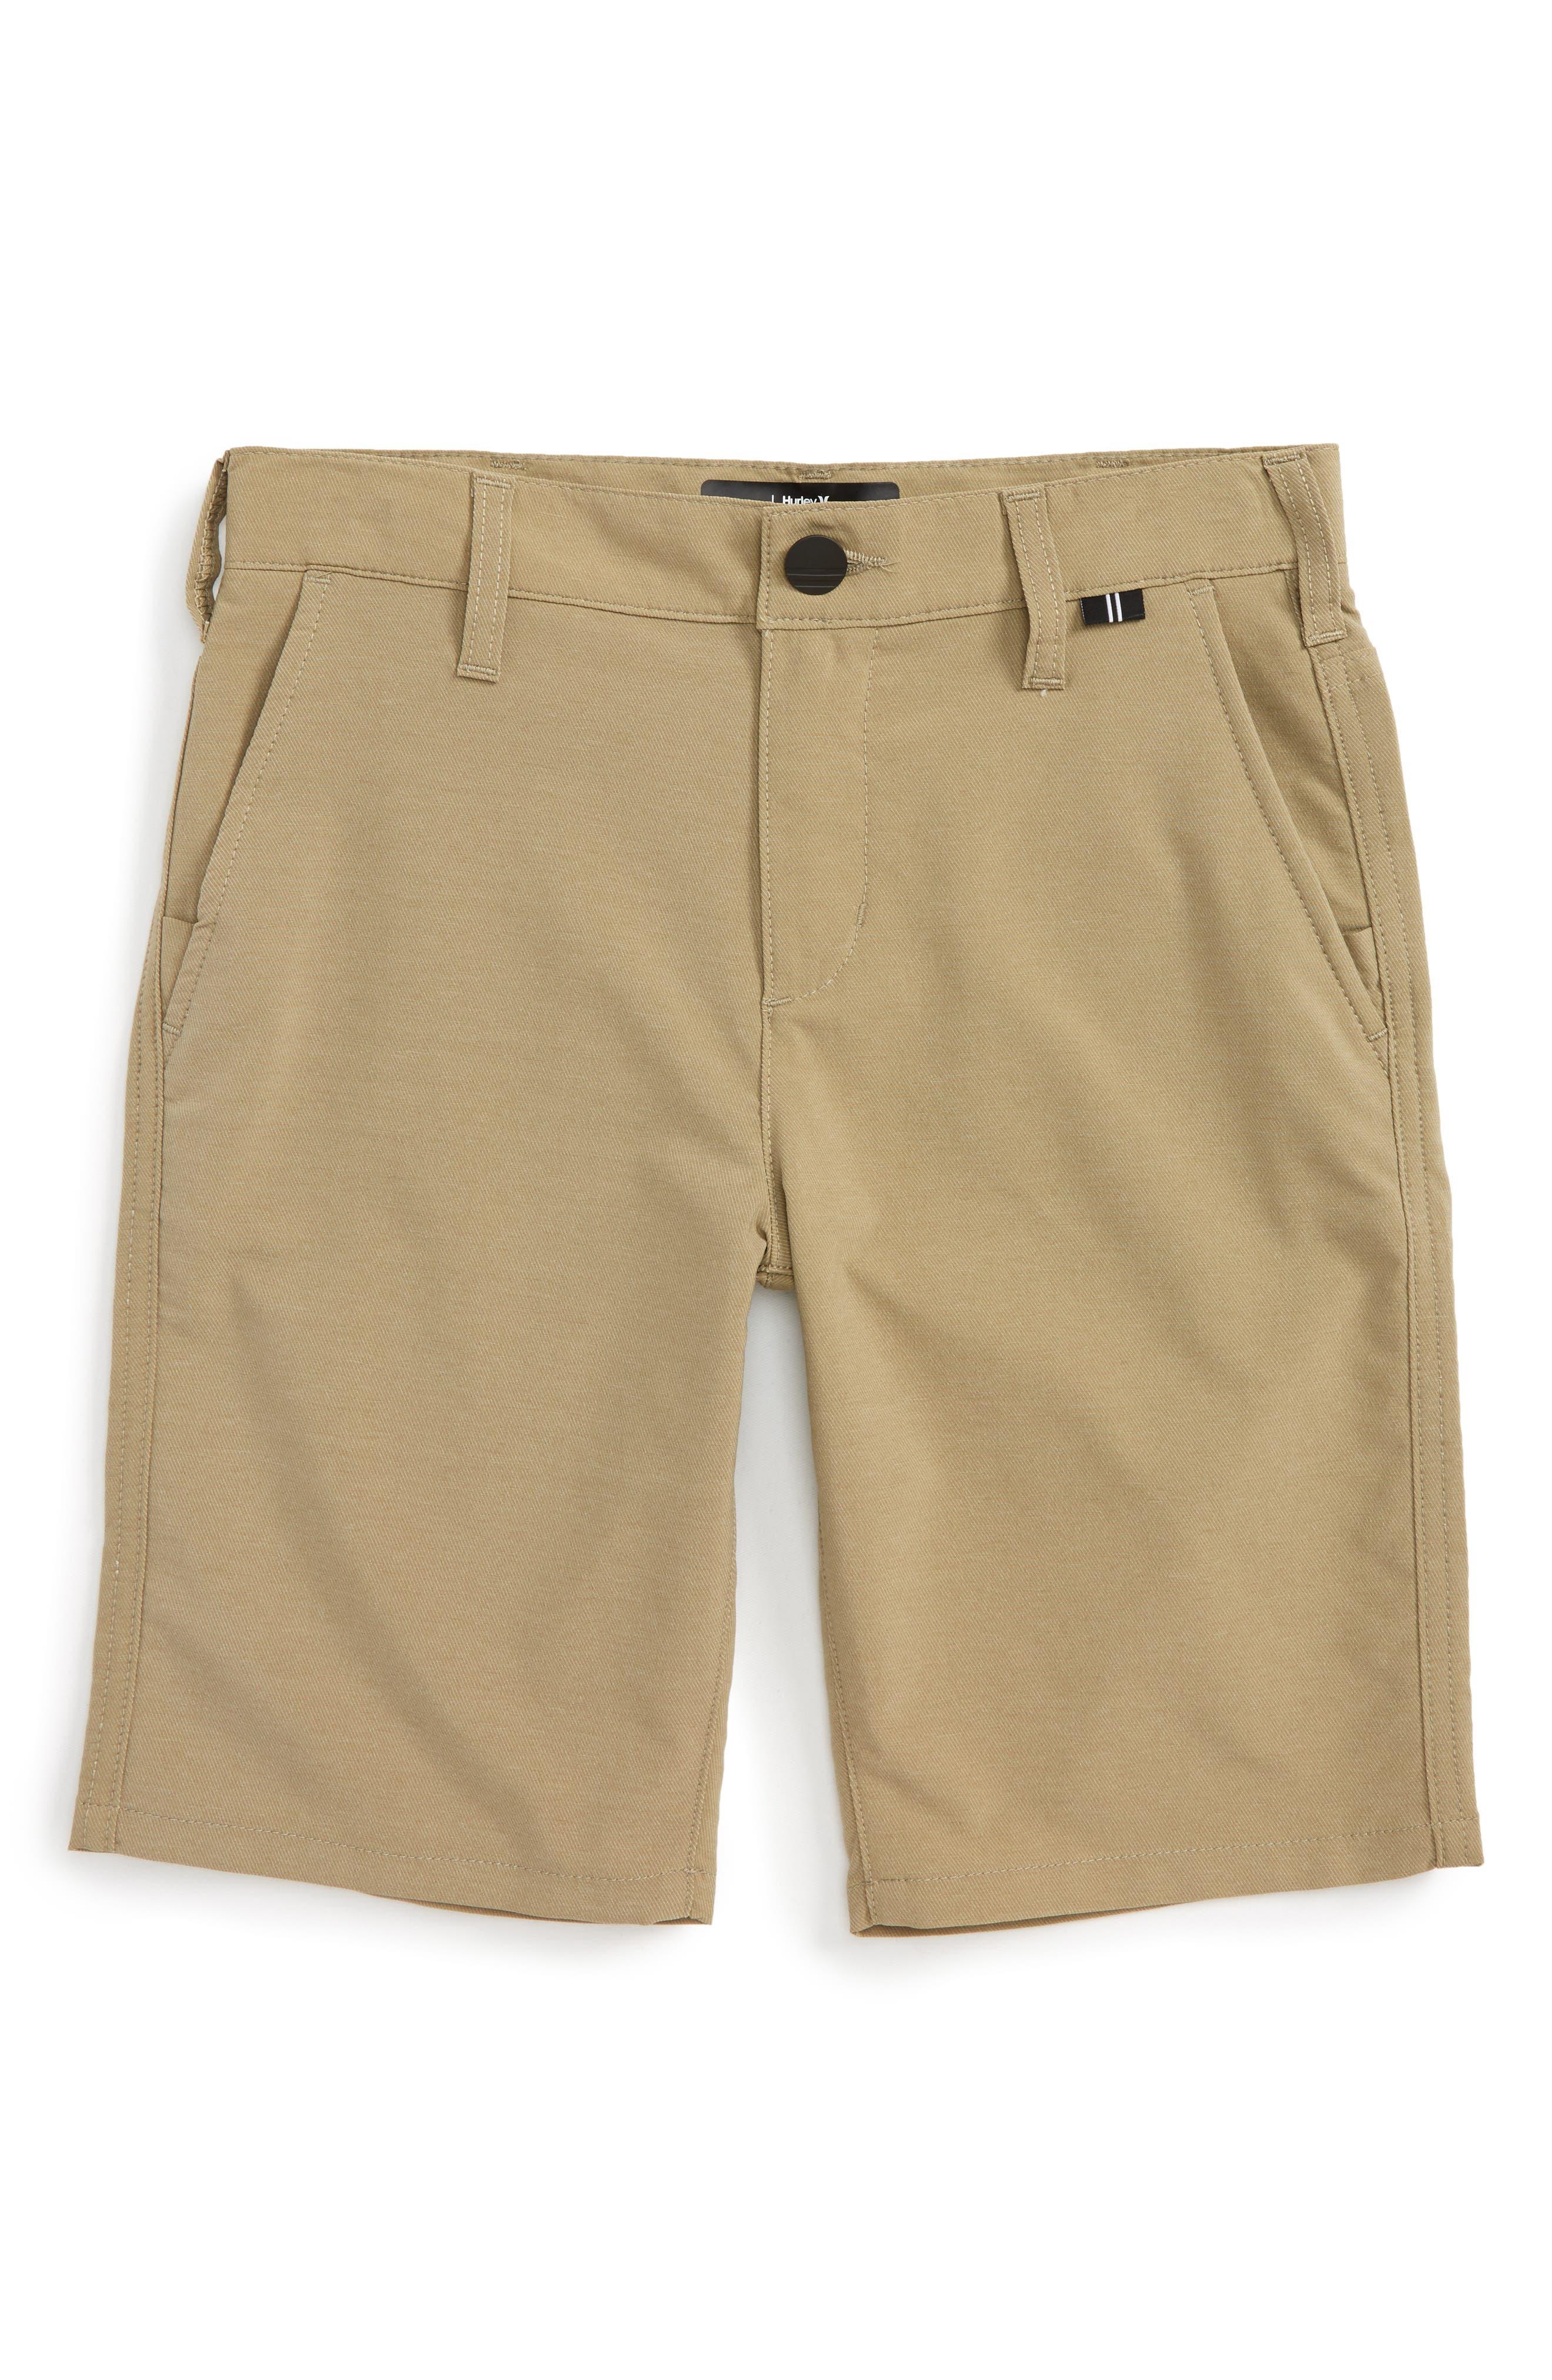 Hurley Dri-FIT Chino Shorts (Big Boys)